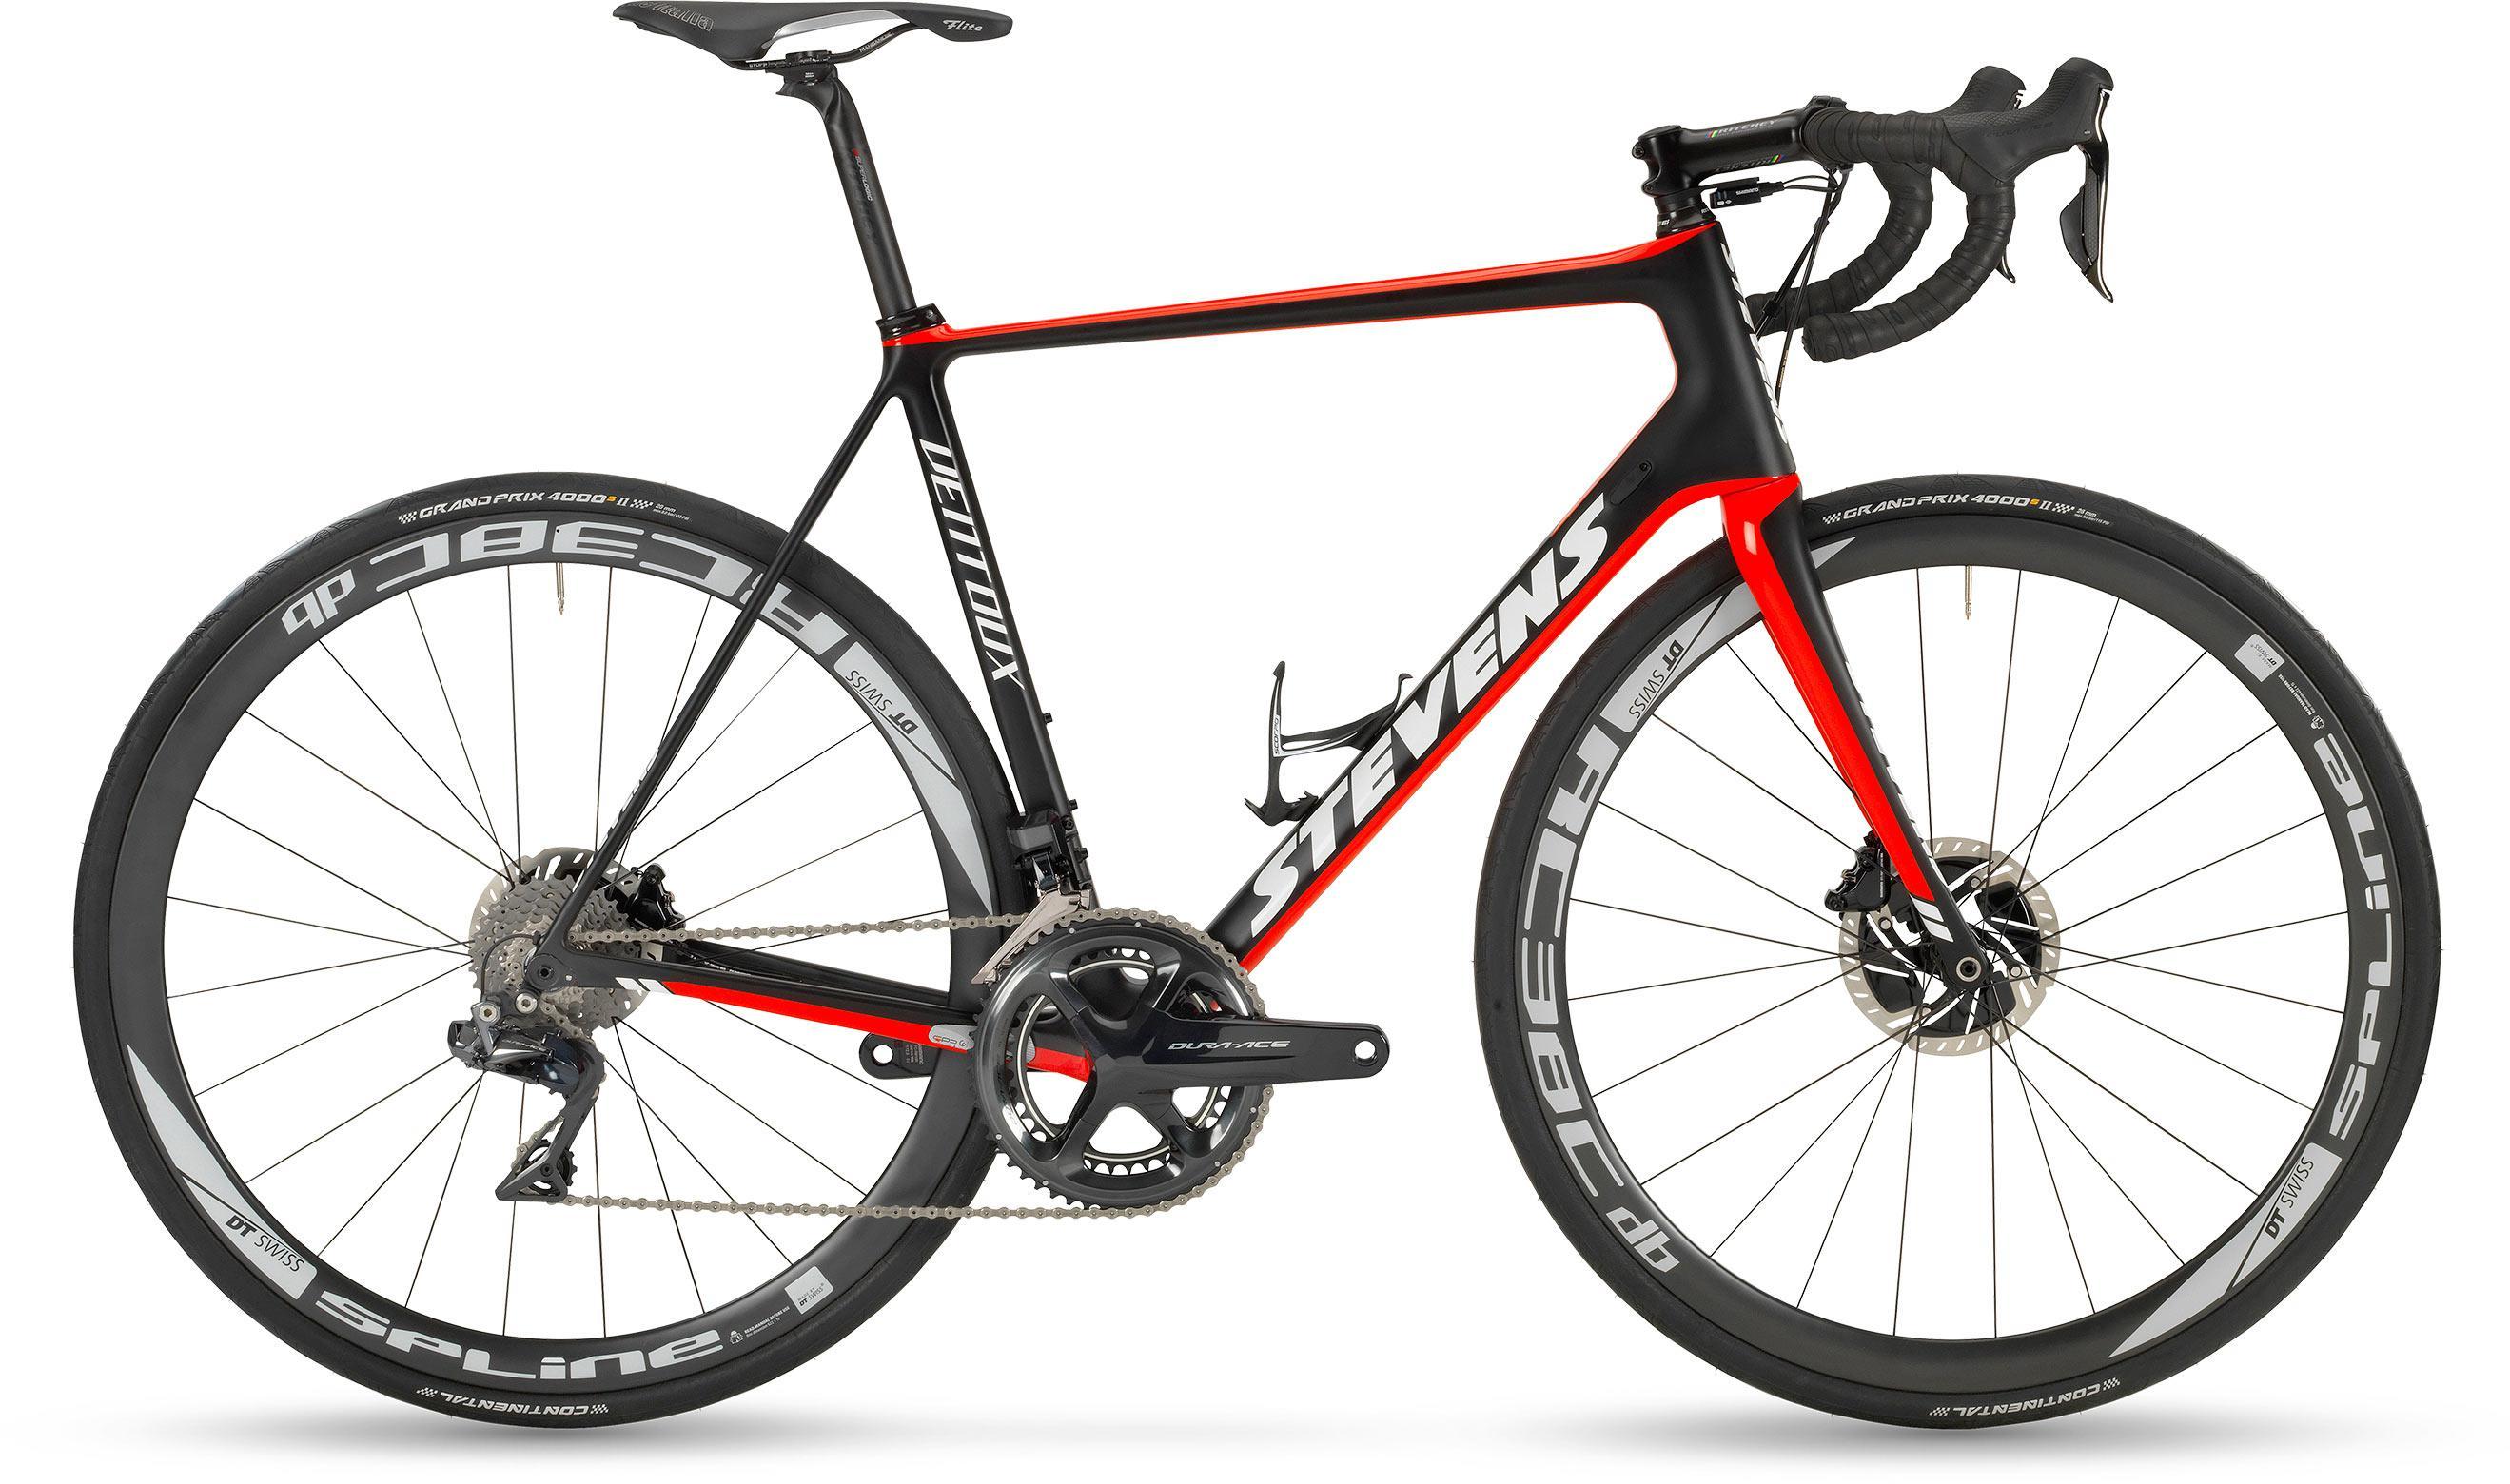 Stevens Ventoux Disc Rahmenkit Fahrradrahmen Rennrad 2018